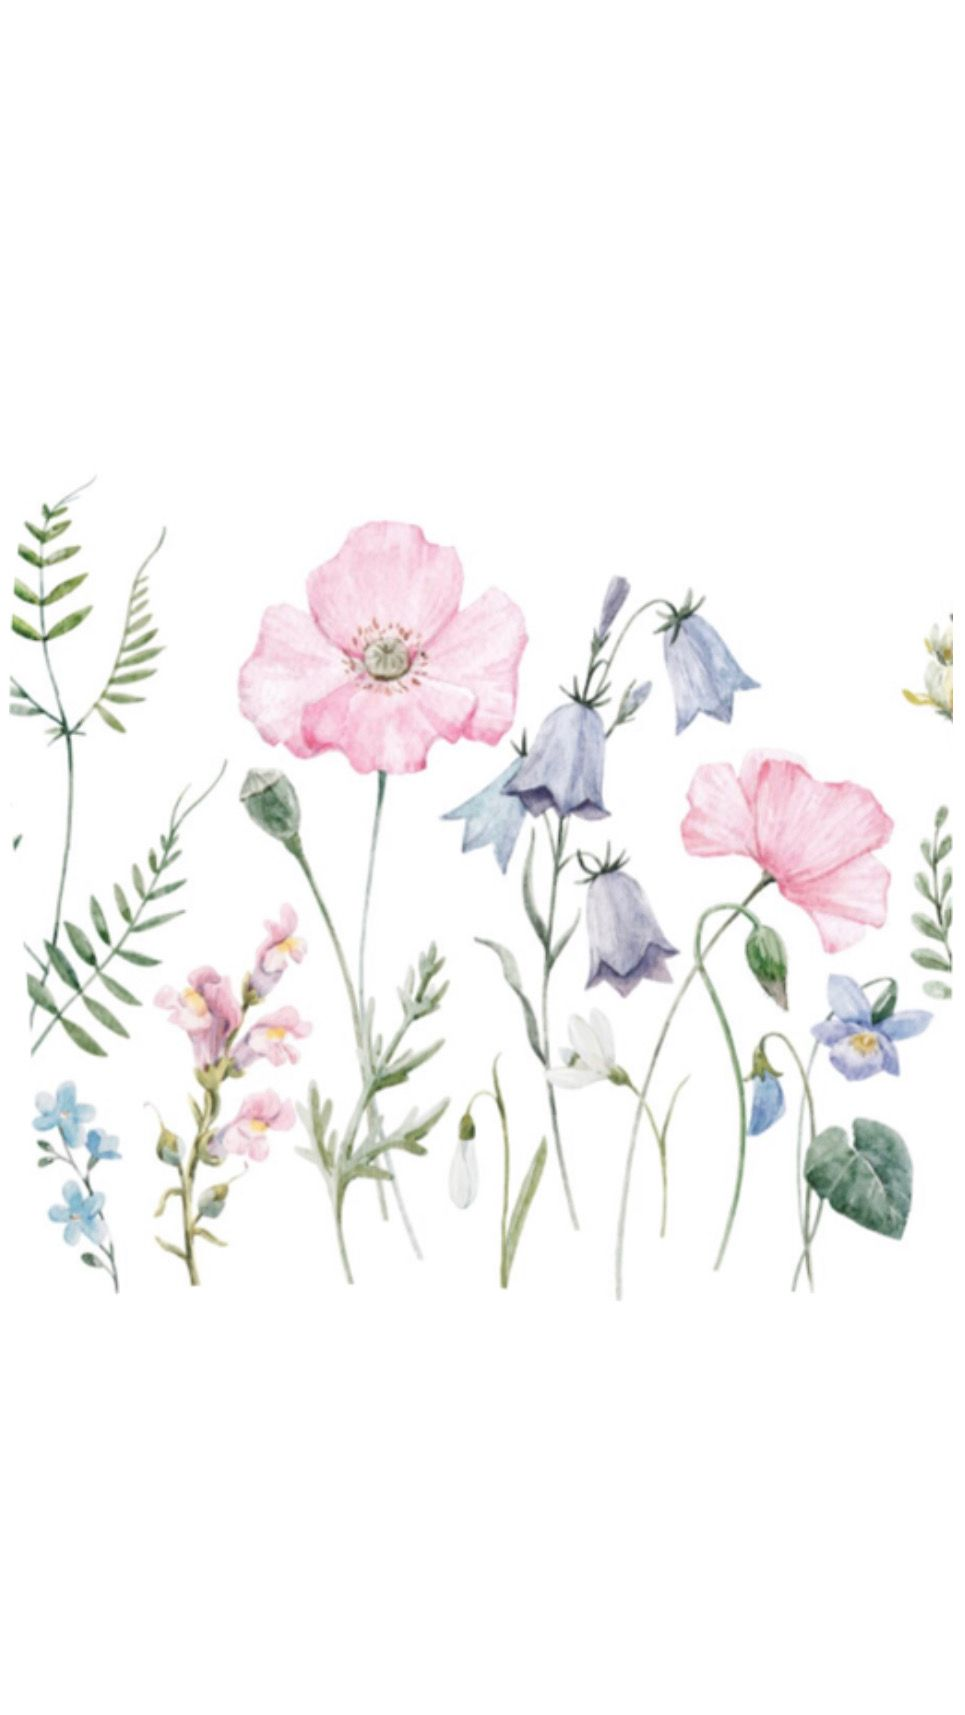 Pin By Pvdspvc On Kasturi Flower Wallpaper Backgrounds Phone